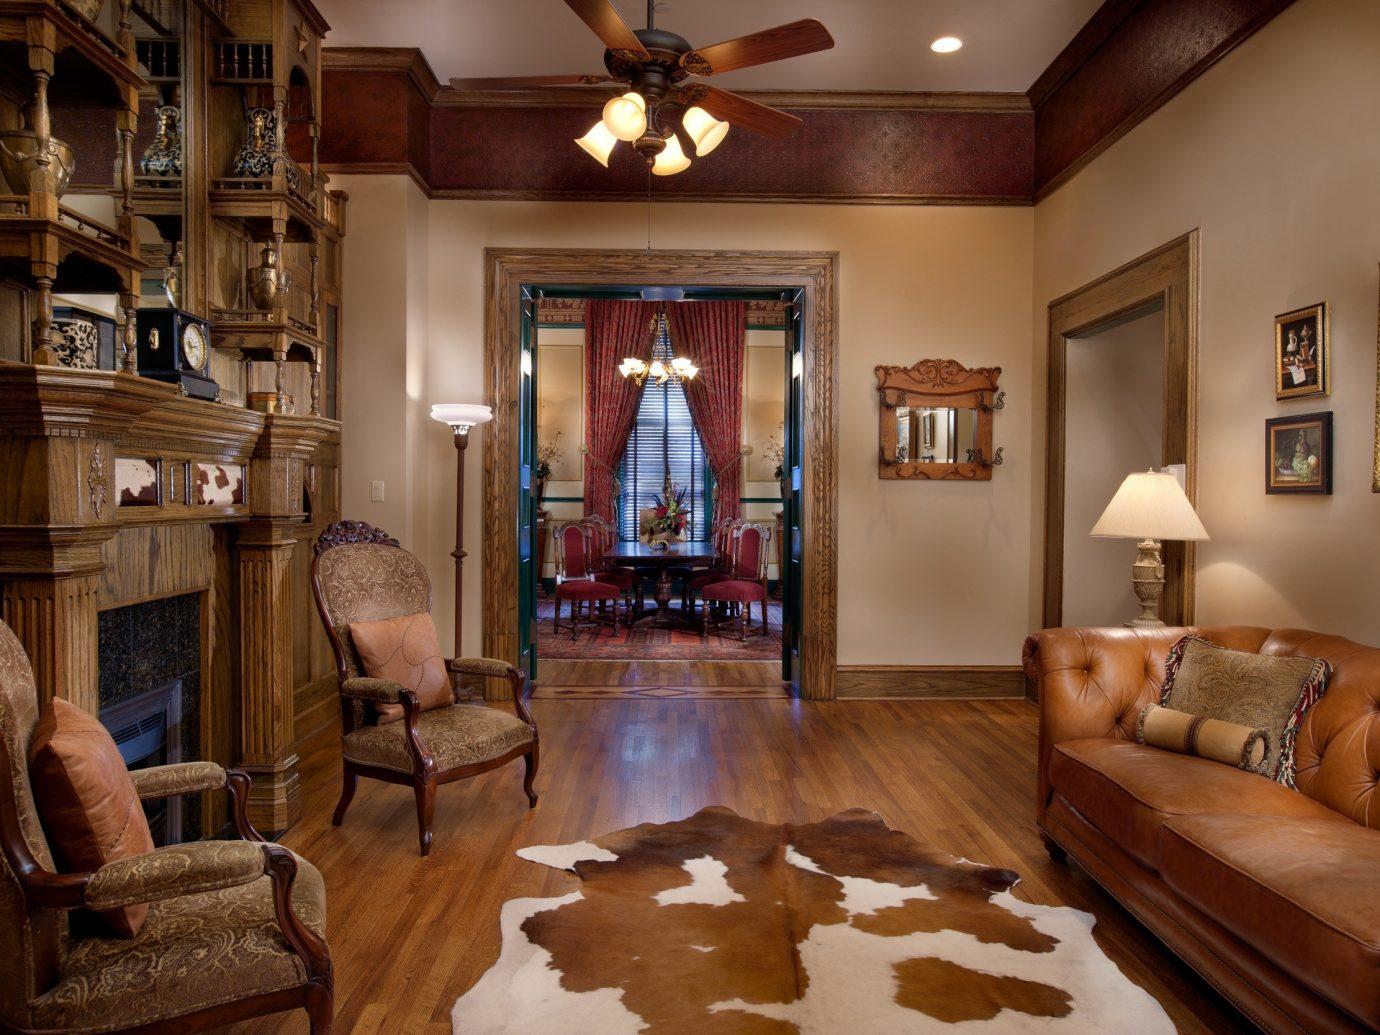 Hotels indoor room floor Living wall interior design ceiling living room home estate real estate furniture area wood decorated